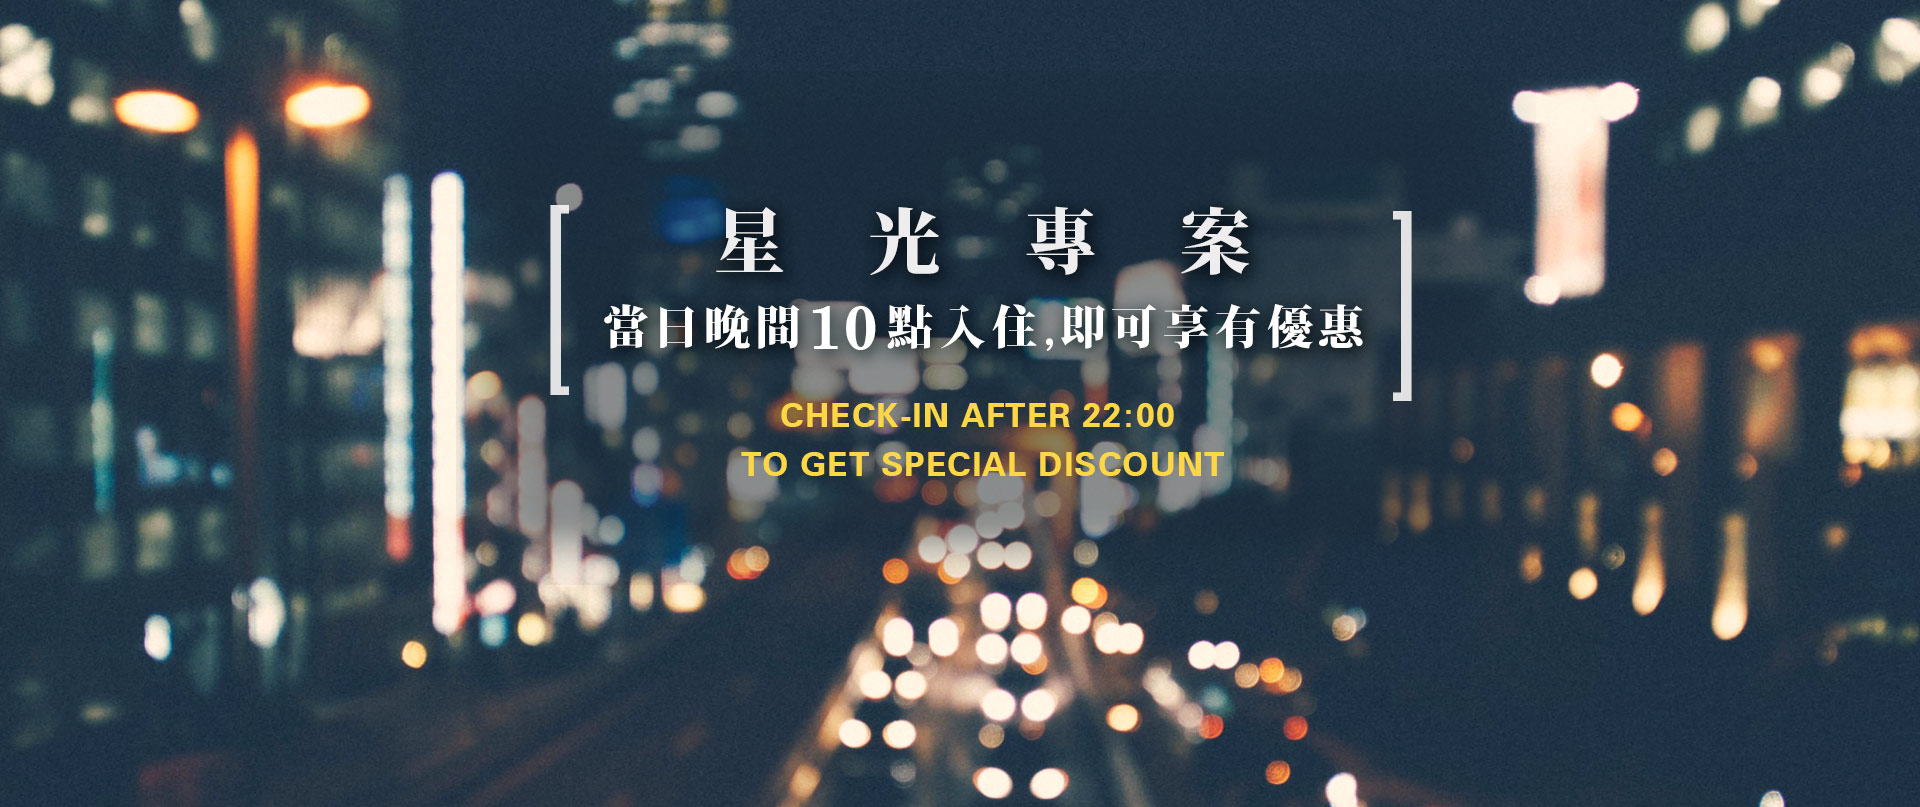 https://booking.taipeiinngroup.com/nv/images/suite/914_103thumb.jpg